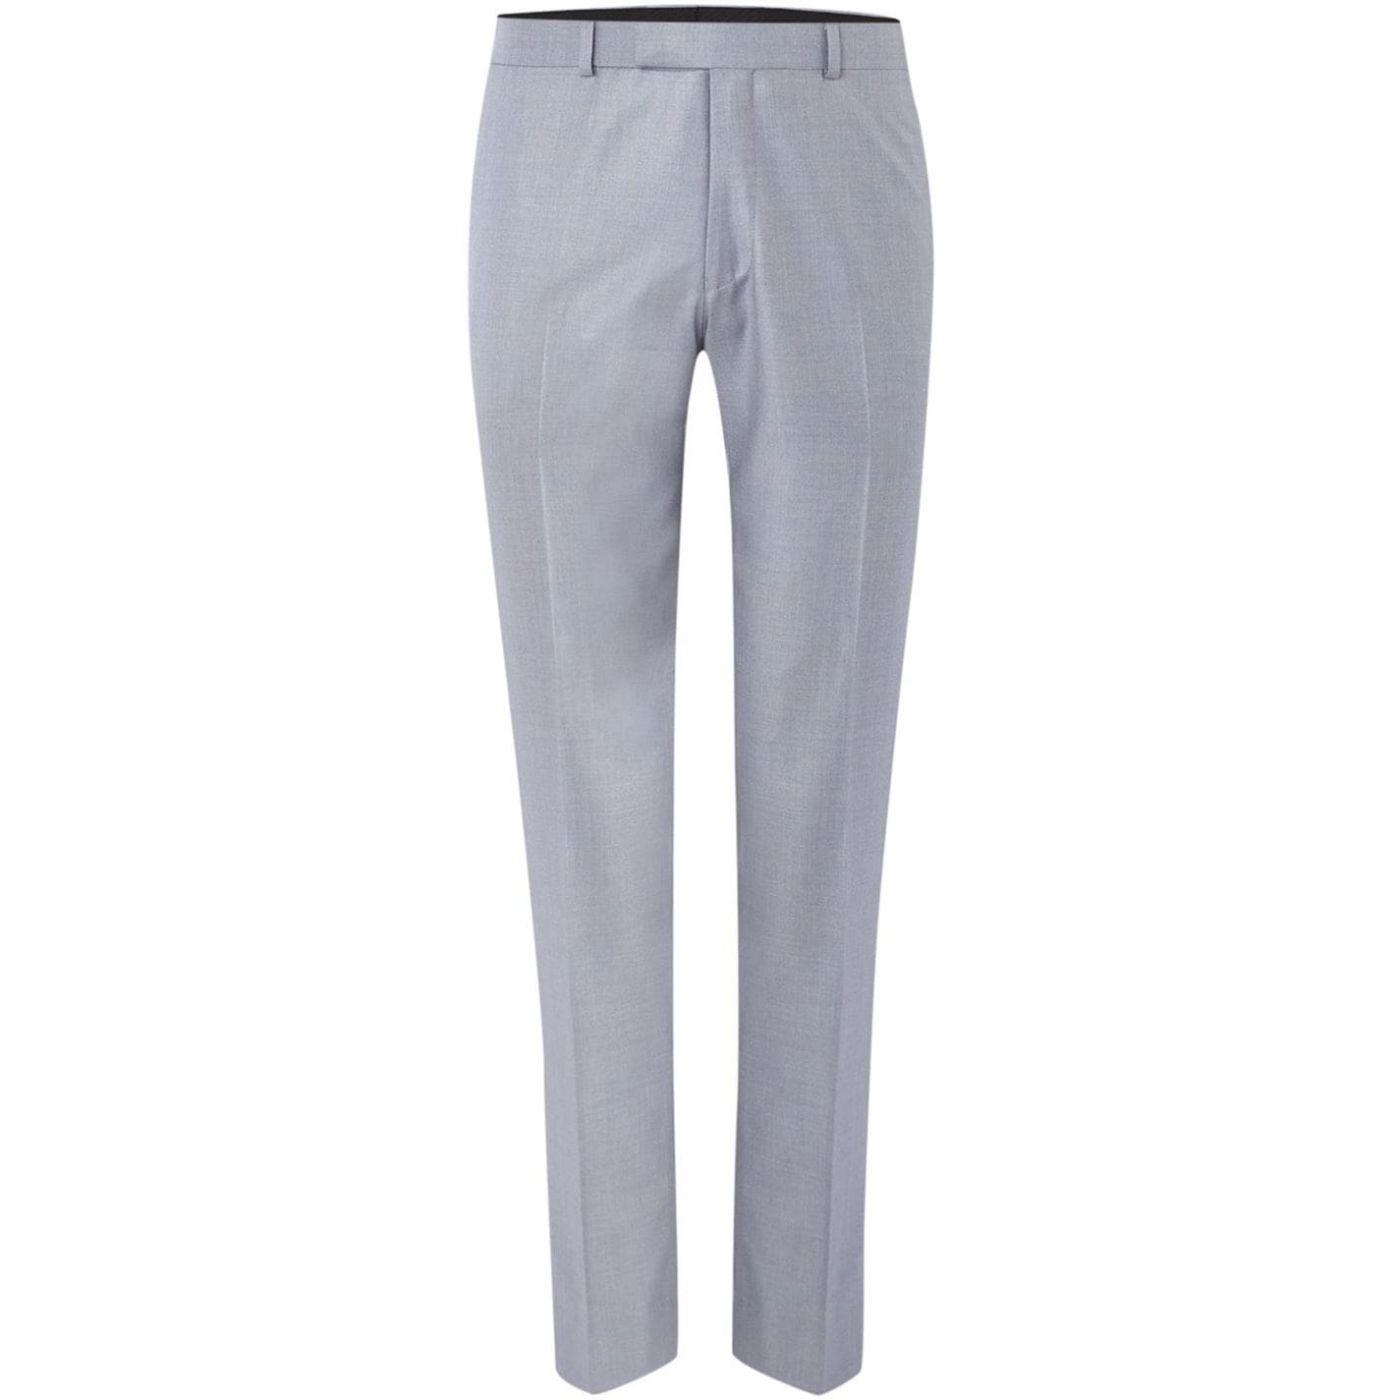 Kenneth Cole Skylar Slim Flat Front Trousers